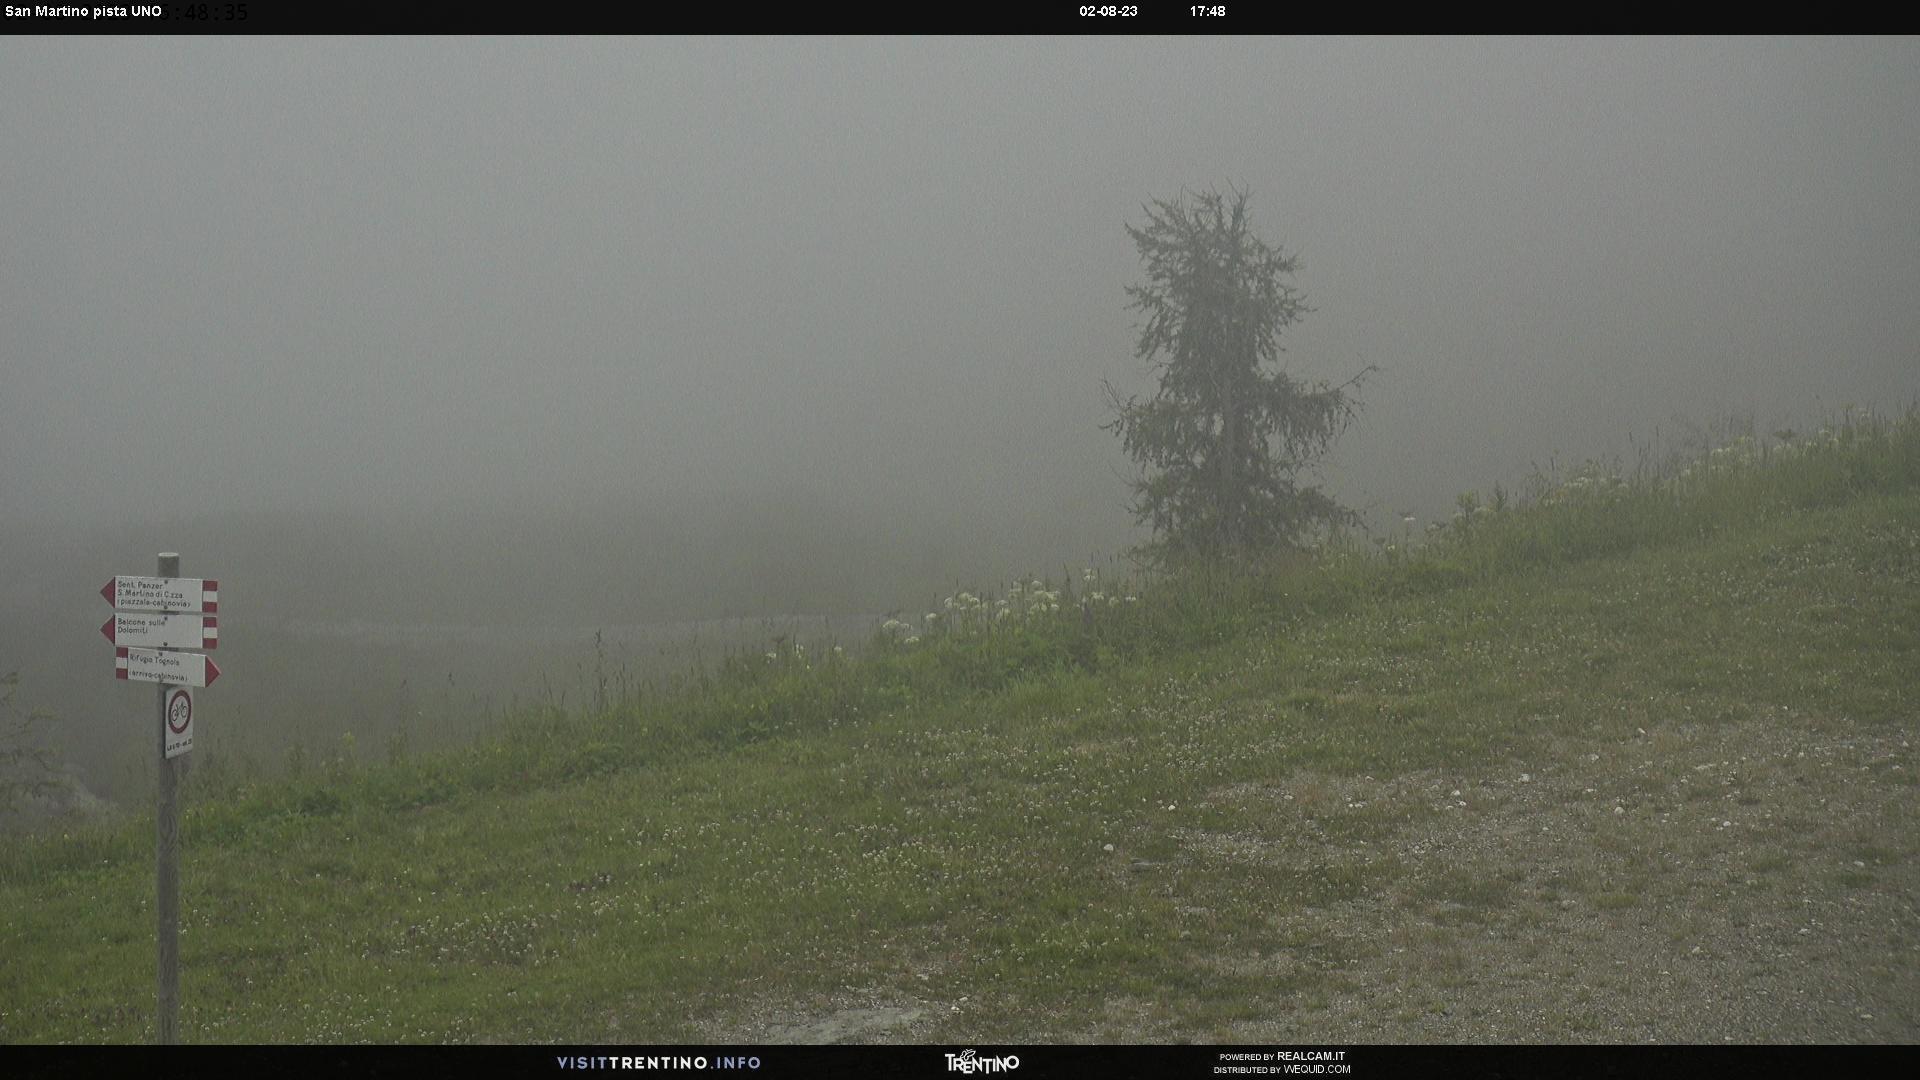 Webcam Tognola